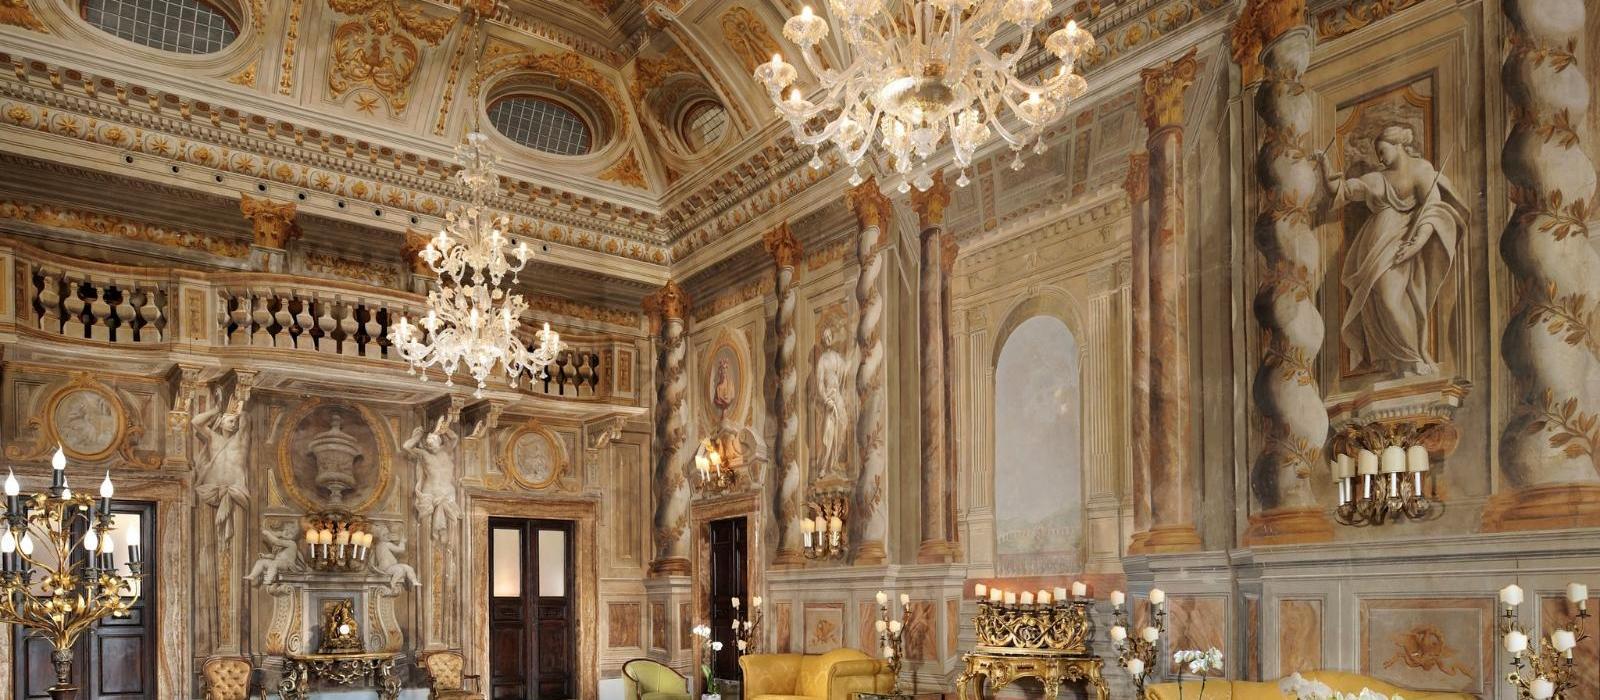 欧陆大酒店(Grand Hotel Continental) 图片  www.lhw.cn